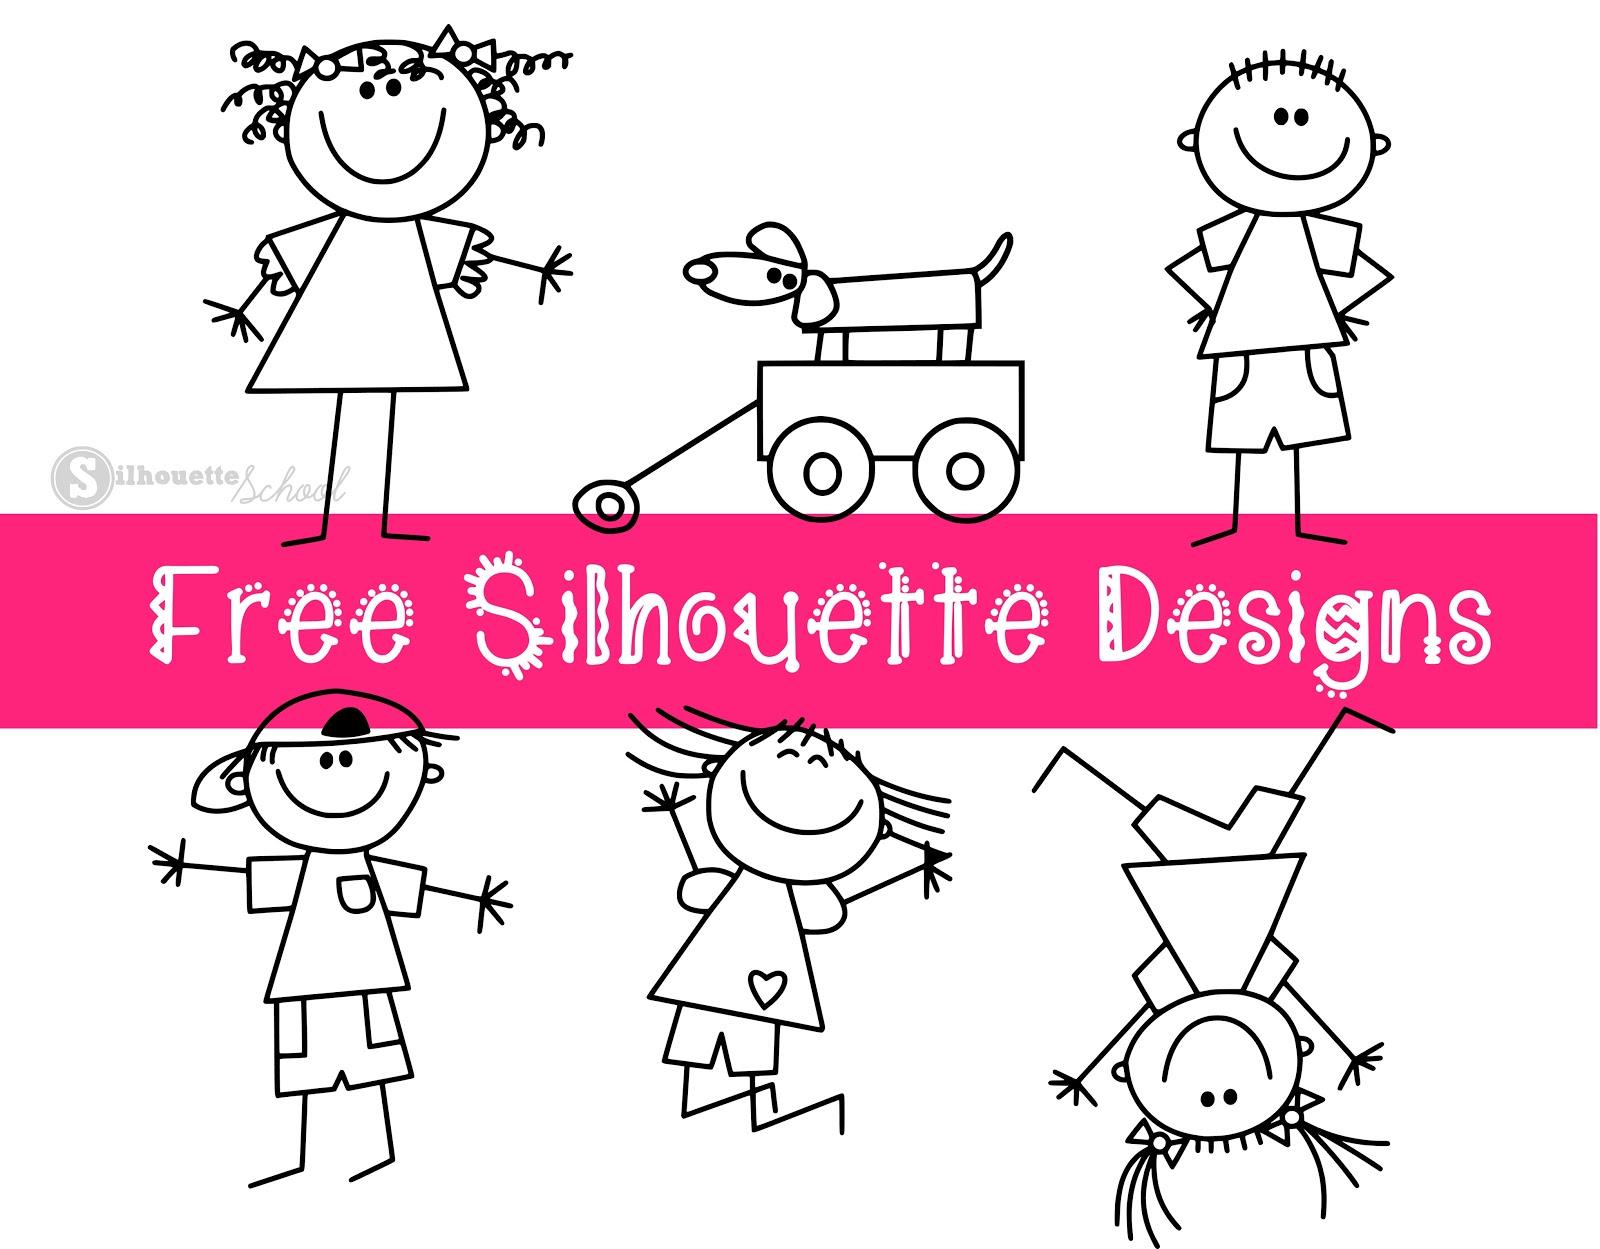 Stick People Design Set: Free Silhouette Designs